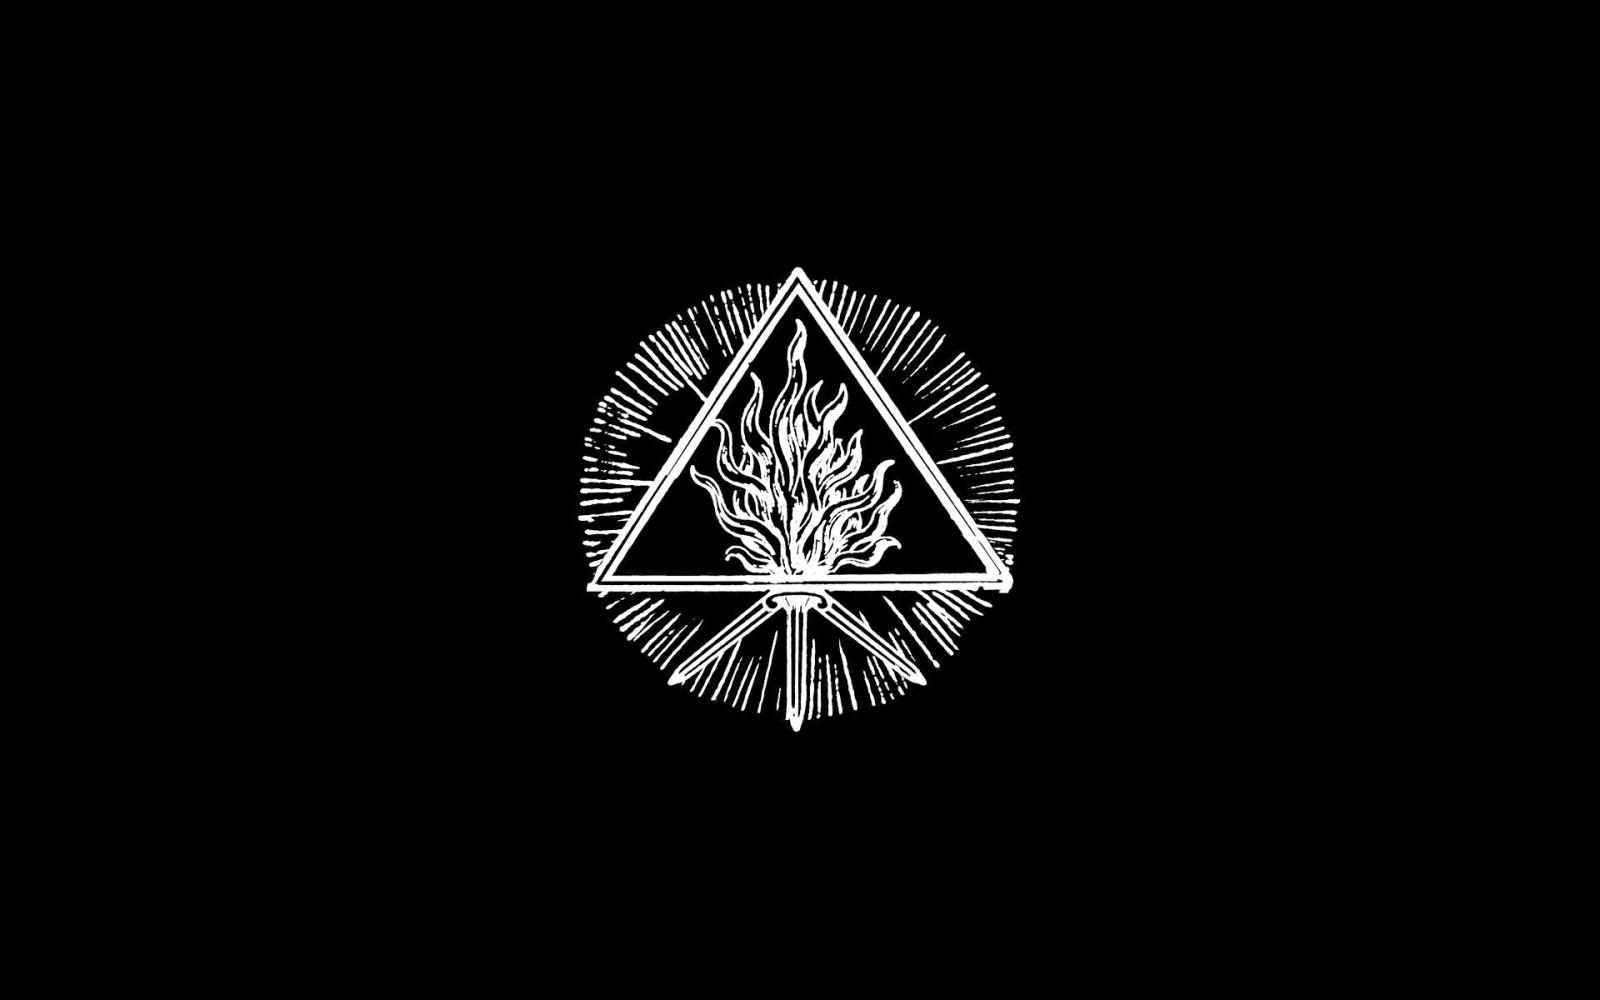 Red King Behemoth Alchemy Black Metal